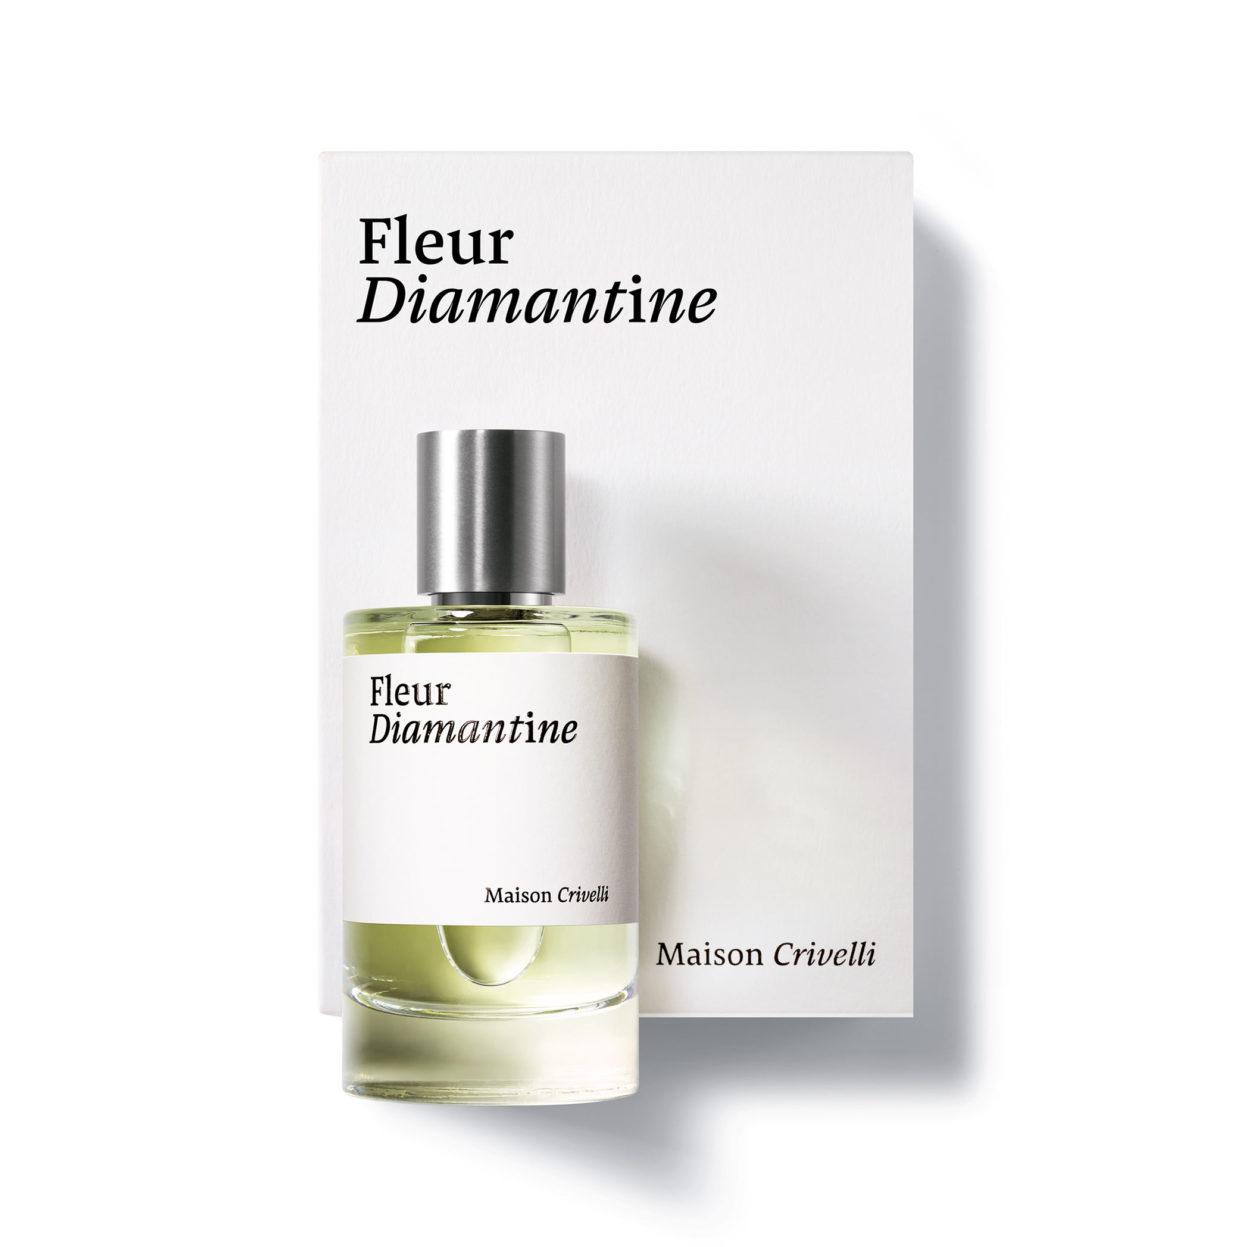 Fleur Diamantine 100ml bottle Bertrand Duchaufour jasmine neroli floral - Maison Crivelli